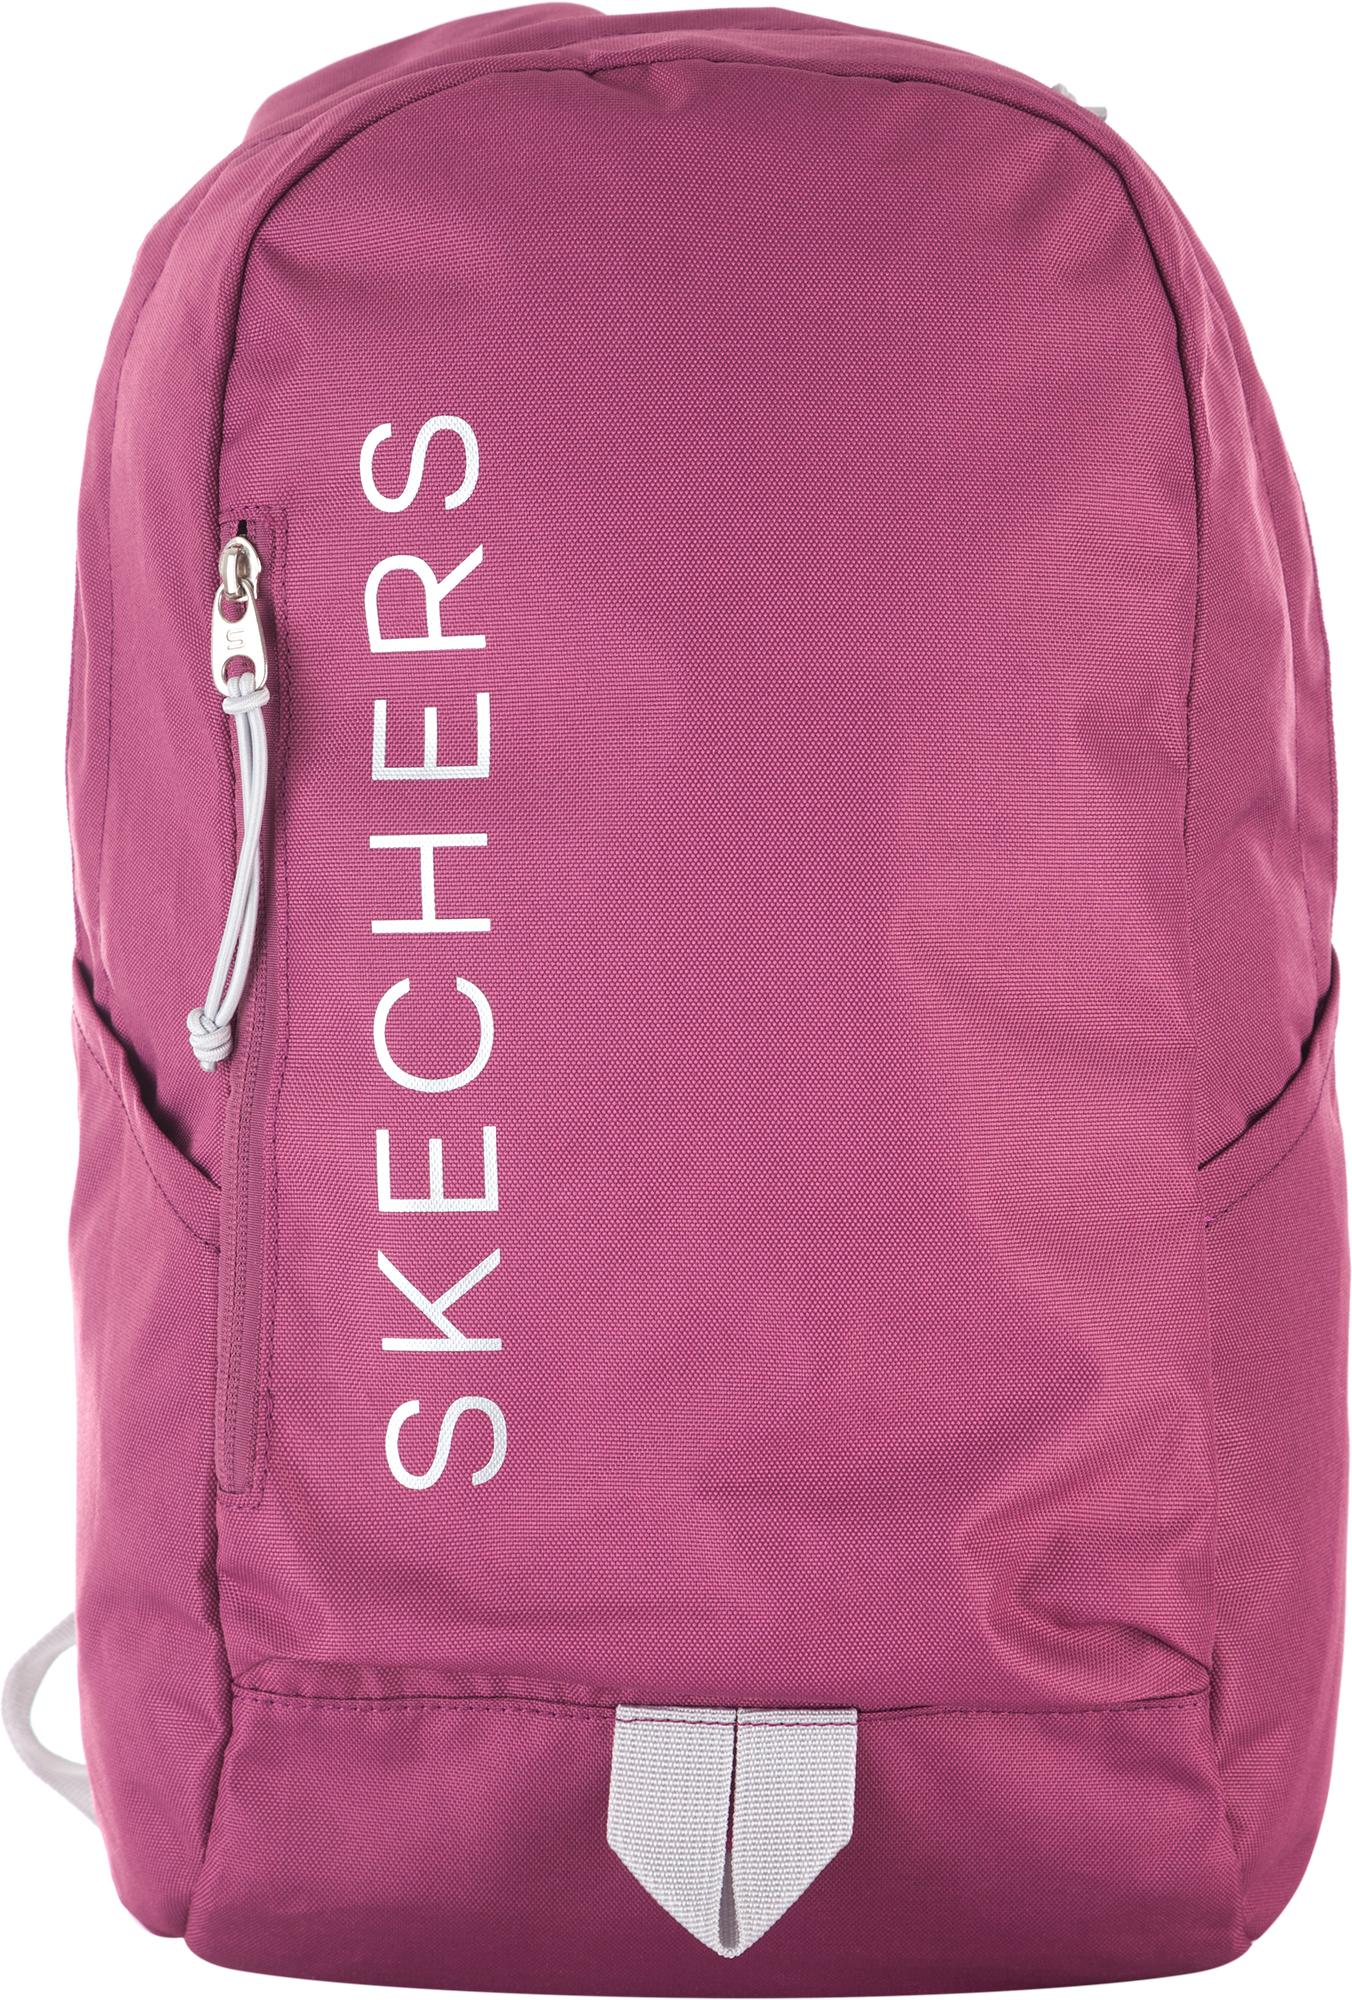 Skechers Рюкзак женский Skechers, размер Без размера